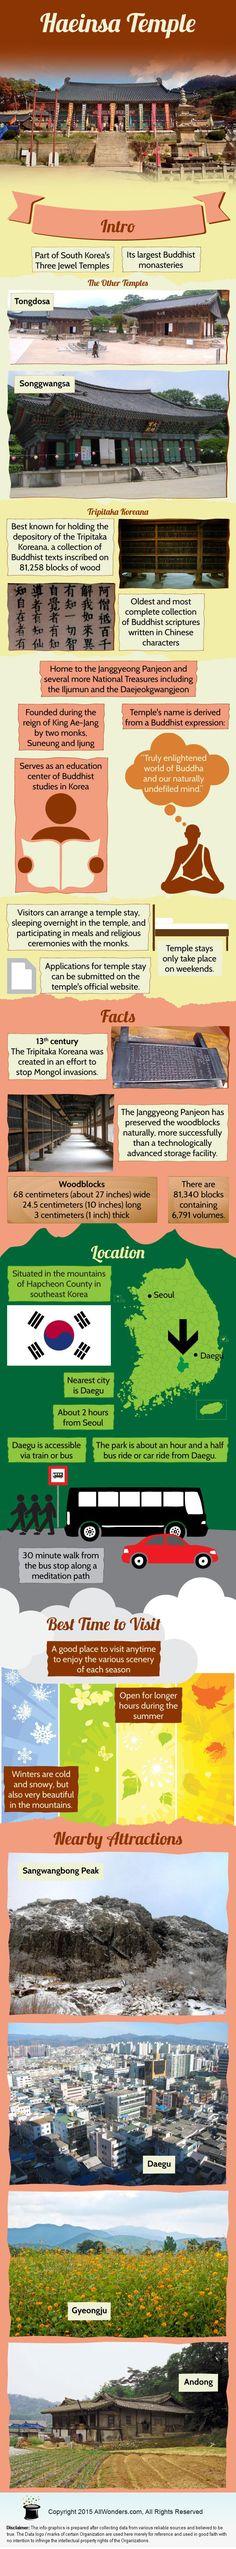 Haeinsa Temple, South Korea